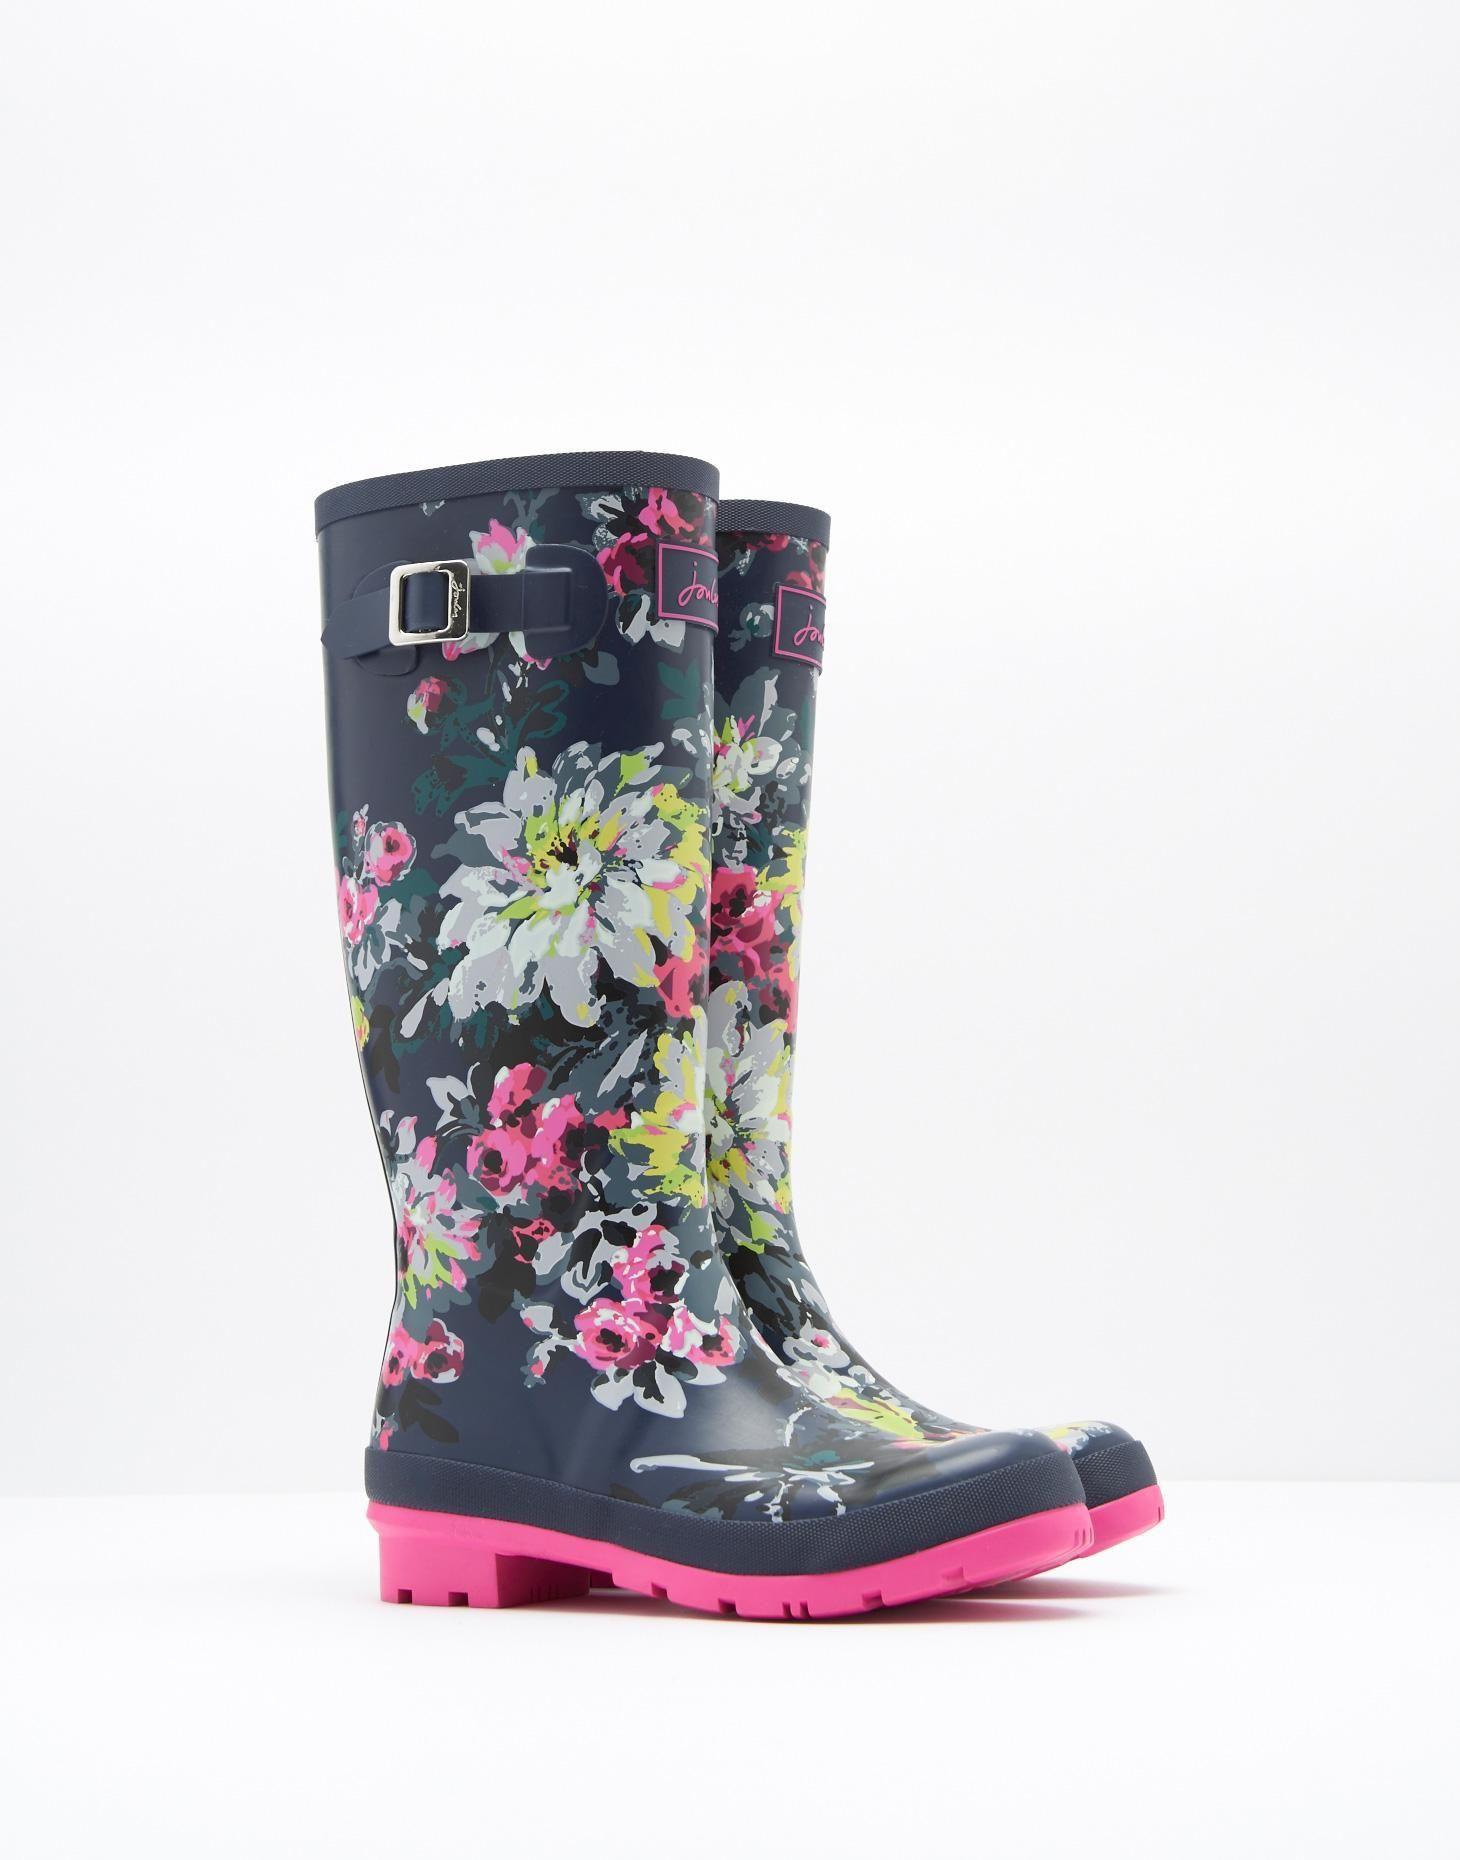 964d9671ac9ad Navy Blue Boots, Flat Boots, Low Heel Boots, Block Heel Shoes, Women's